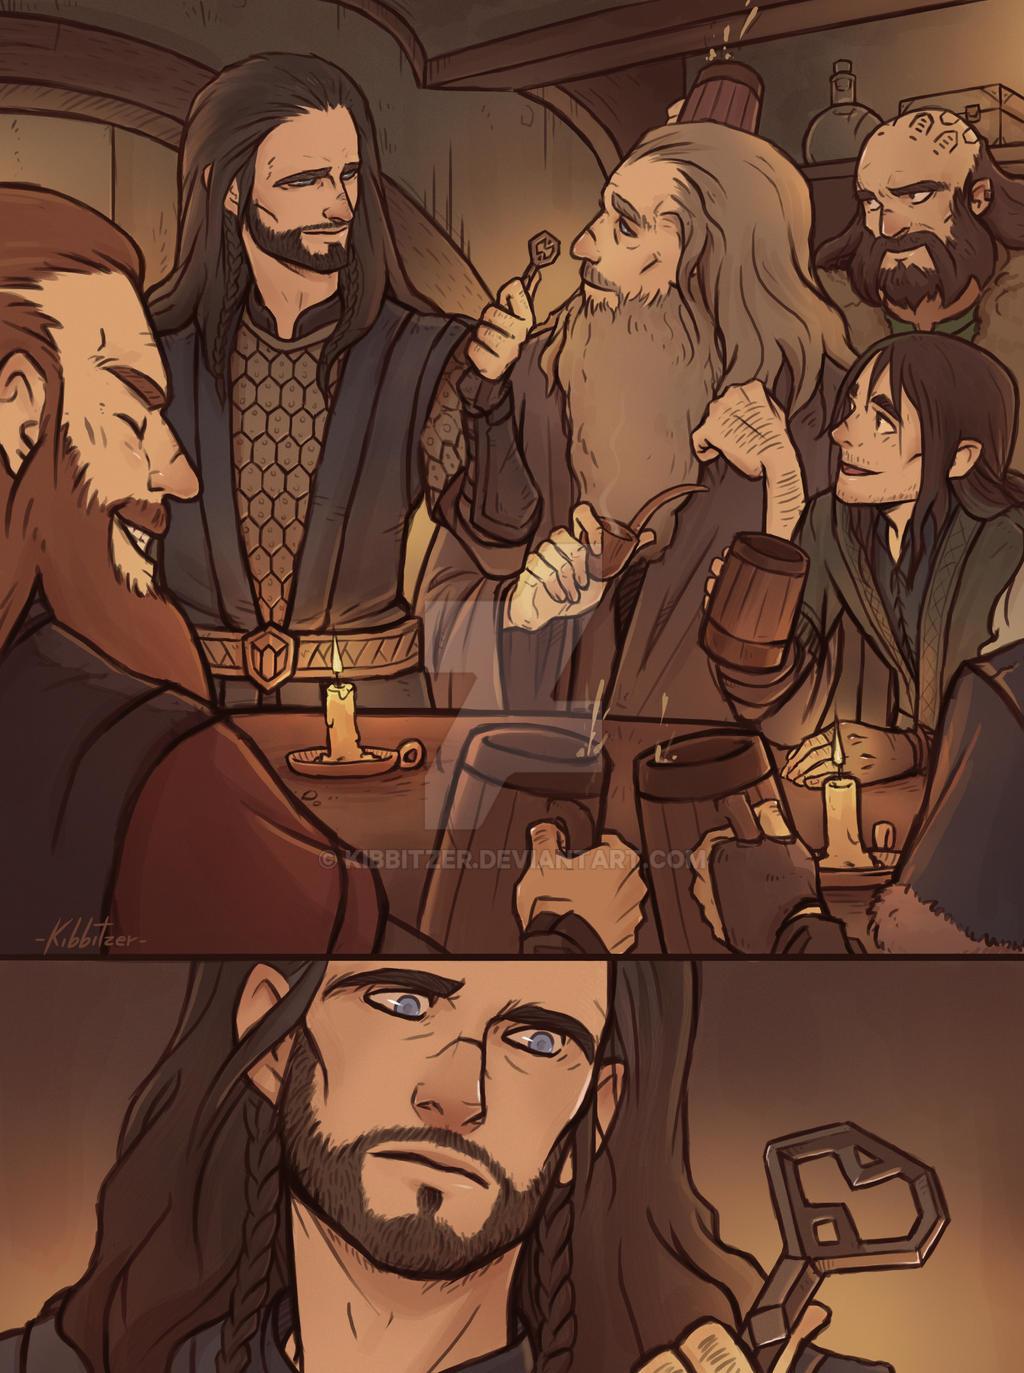 from Otto gay hobbit illustrations